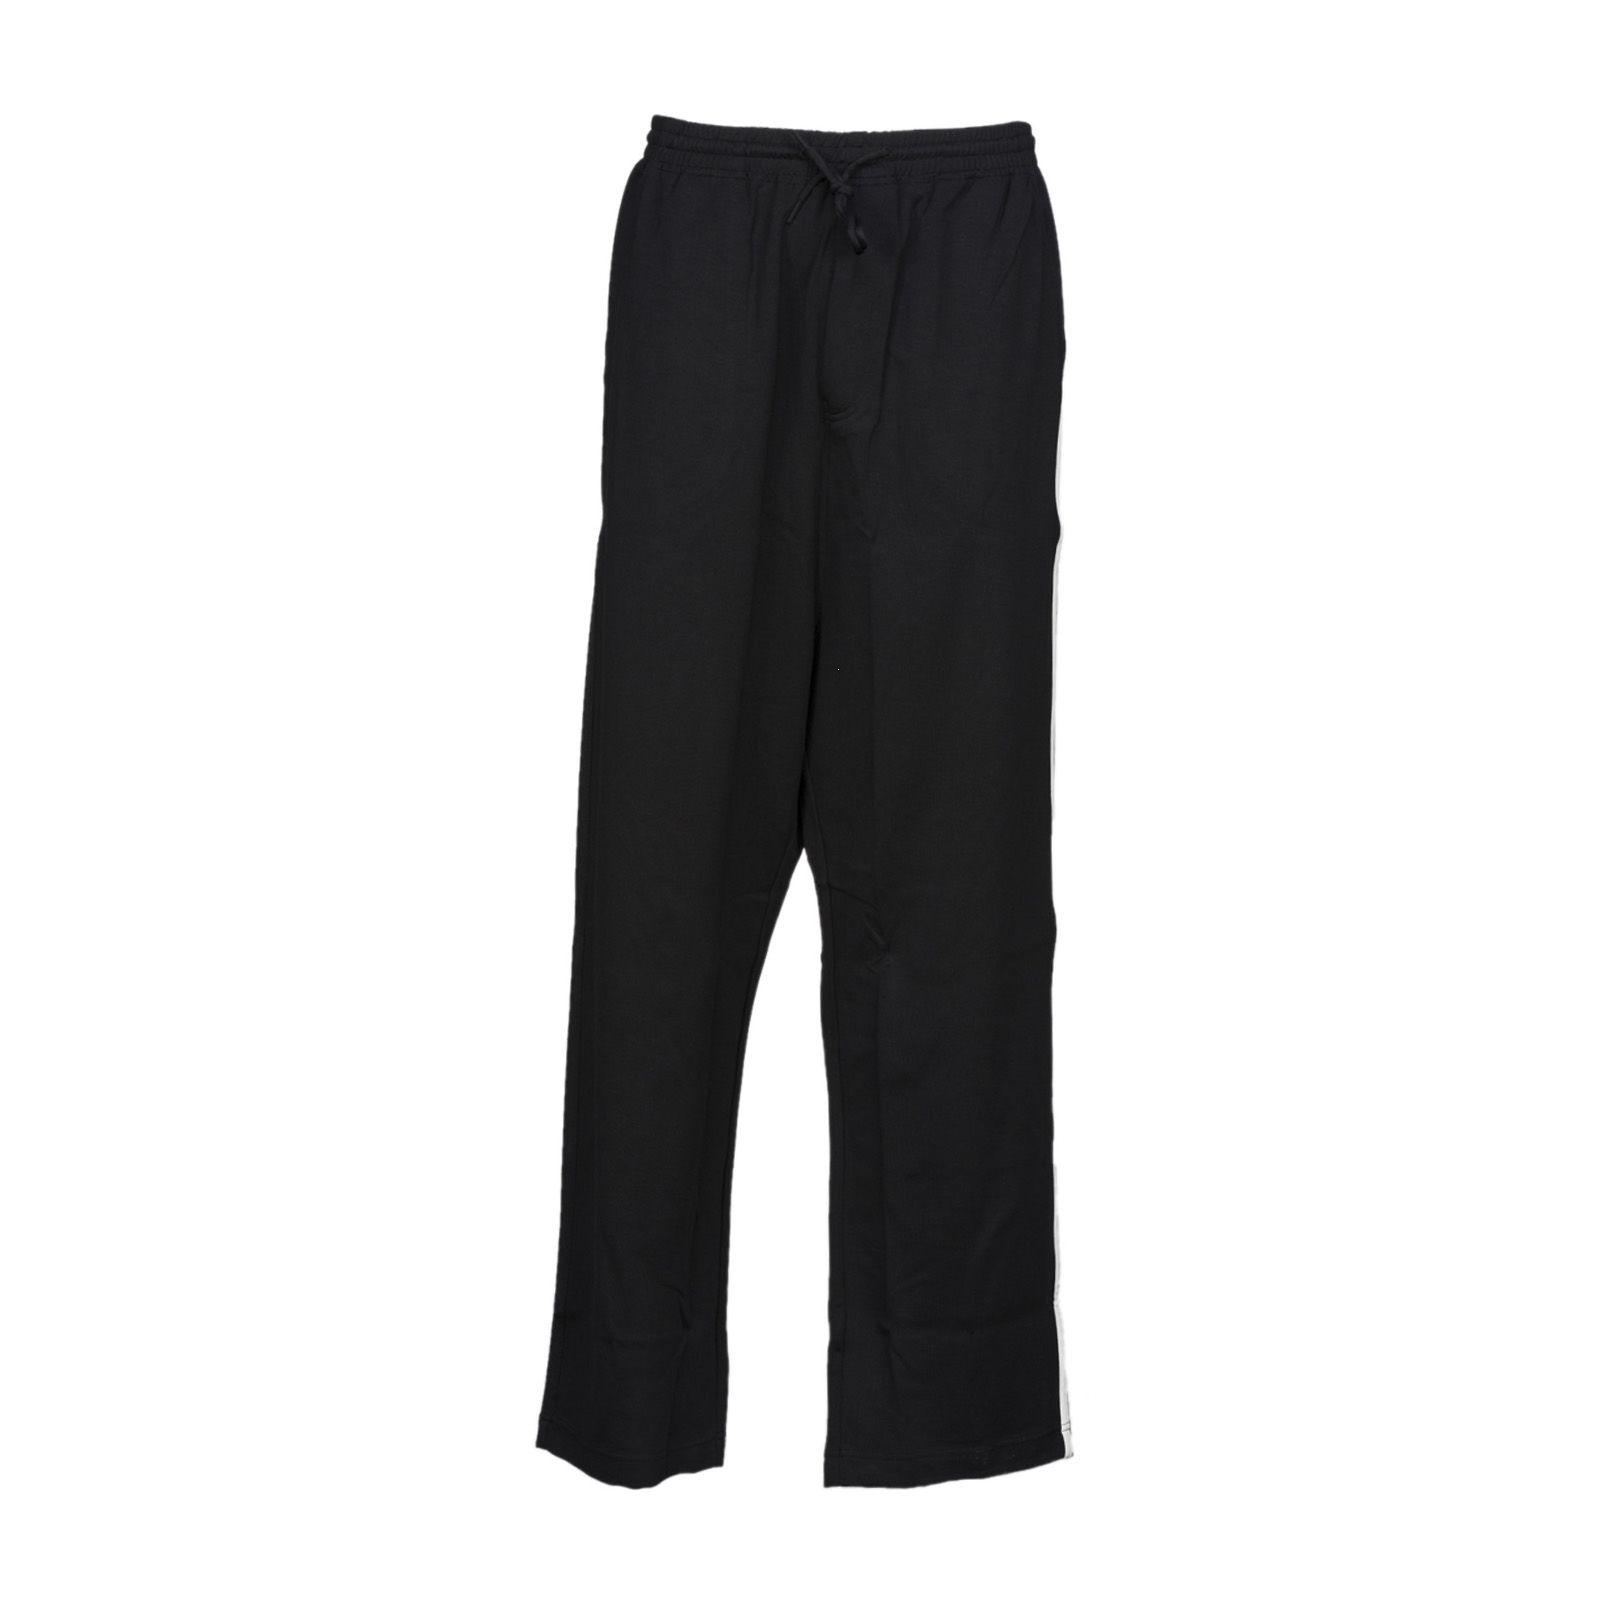 Y-3 Three Stripe Pants